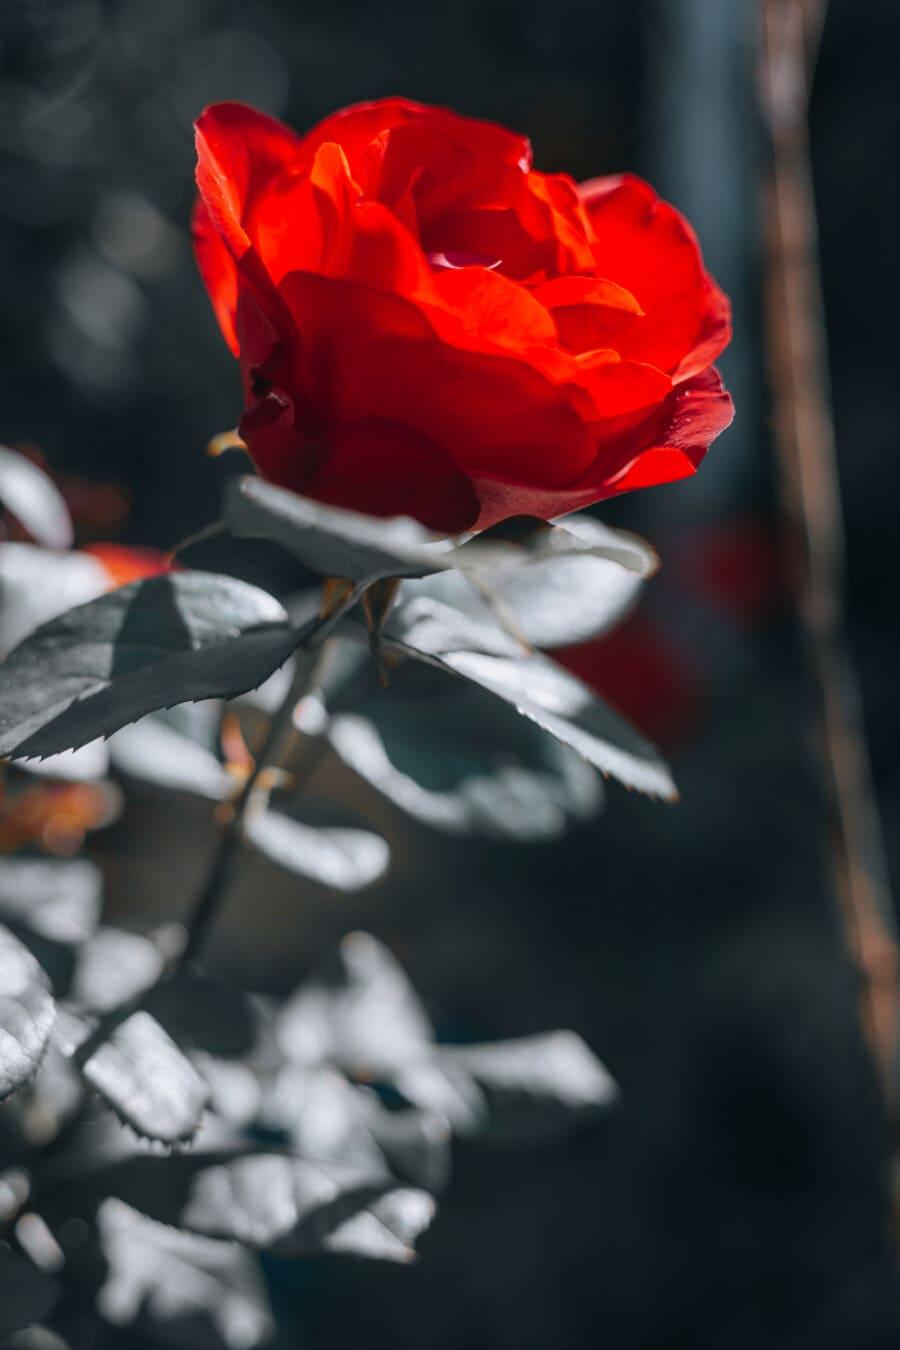 rötlich, stieg, Strauch, Blatt, Natur, Blume, Blütenblatt, Blüte, Knospe, Flora